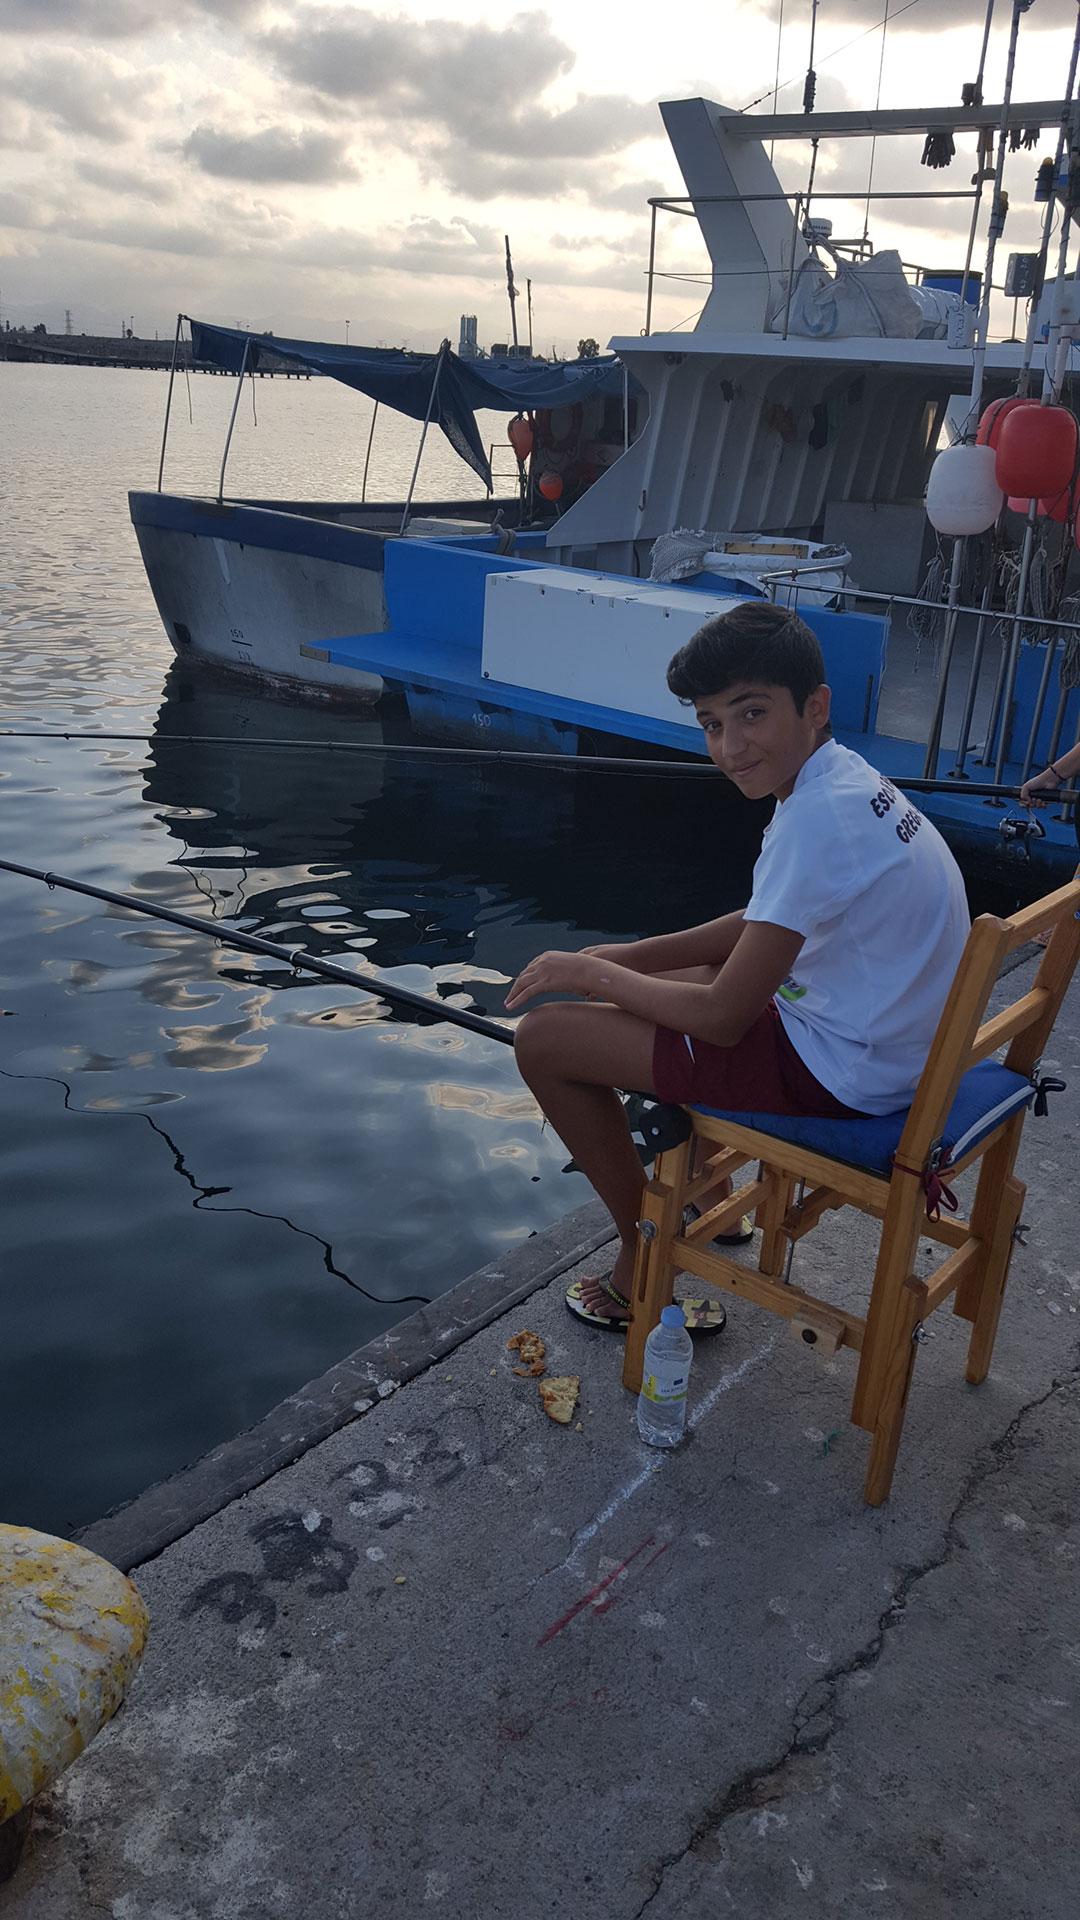 160811-curso-pesca-191635